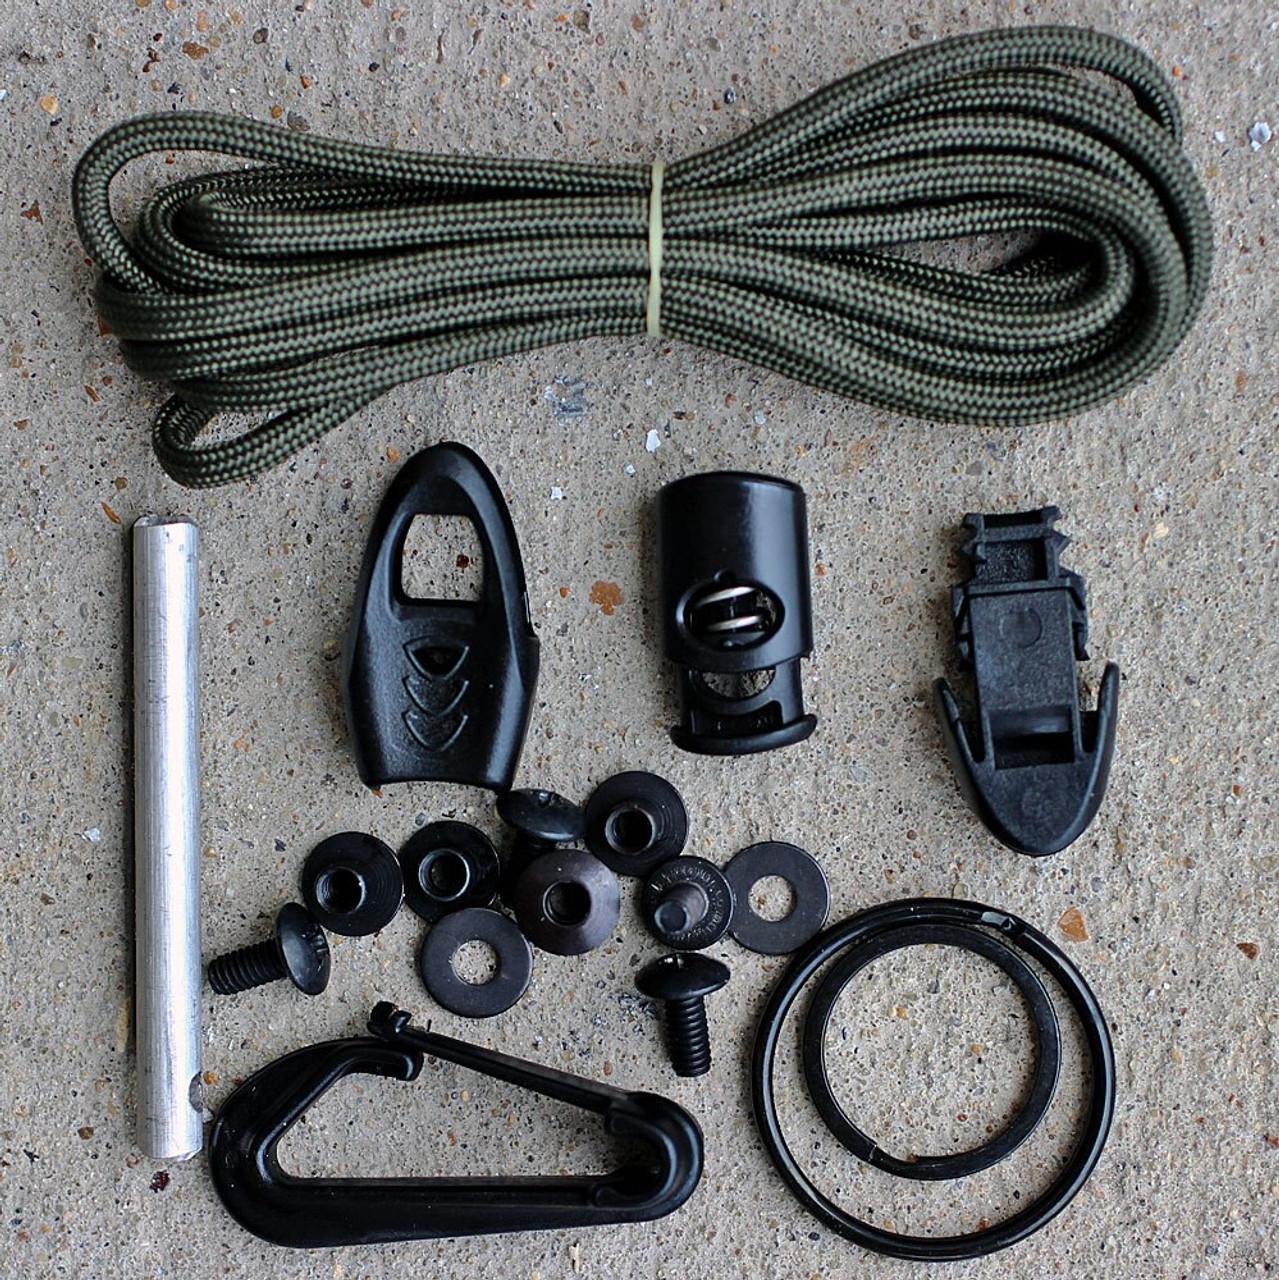 ESEE IZULA Survival Kit & Concealed Carry Knife, Desert Tan No Box